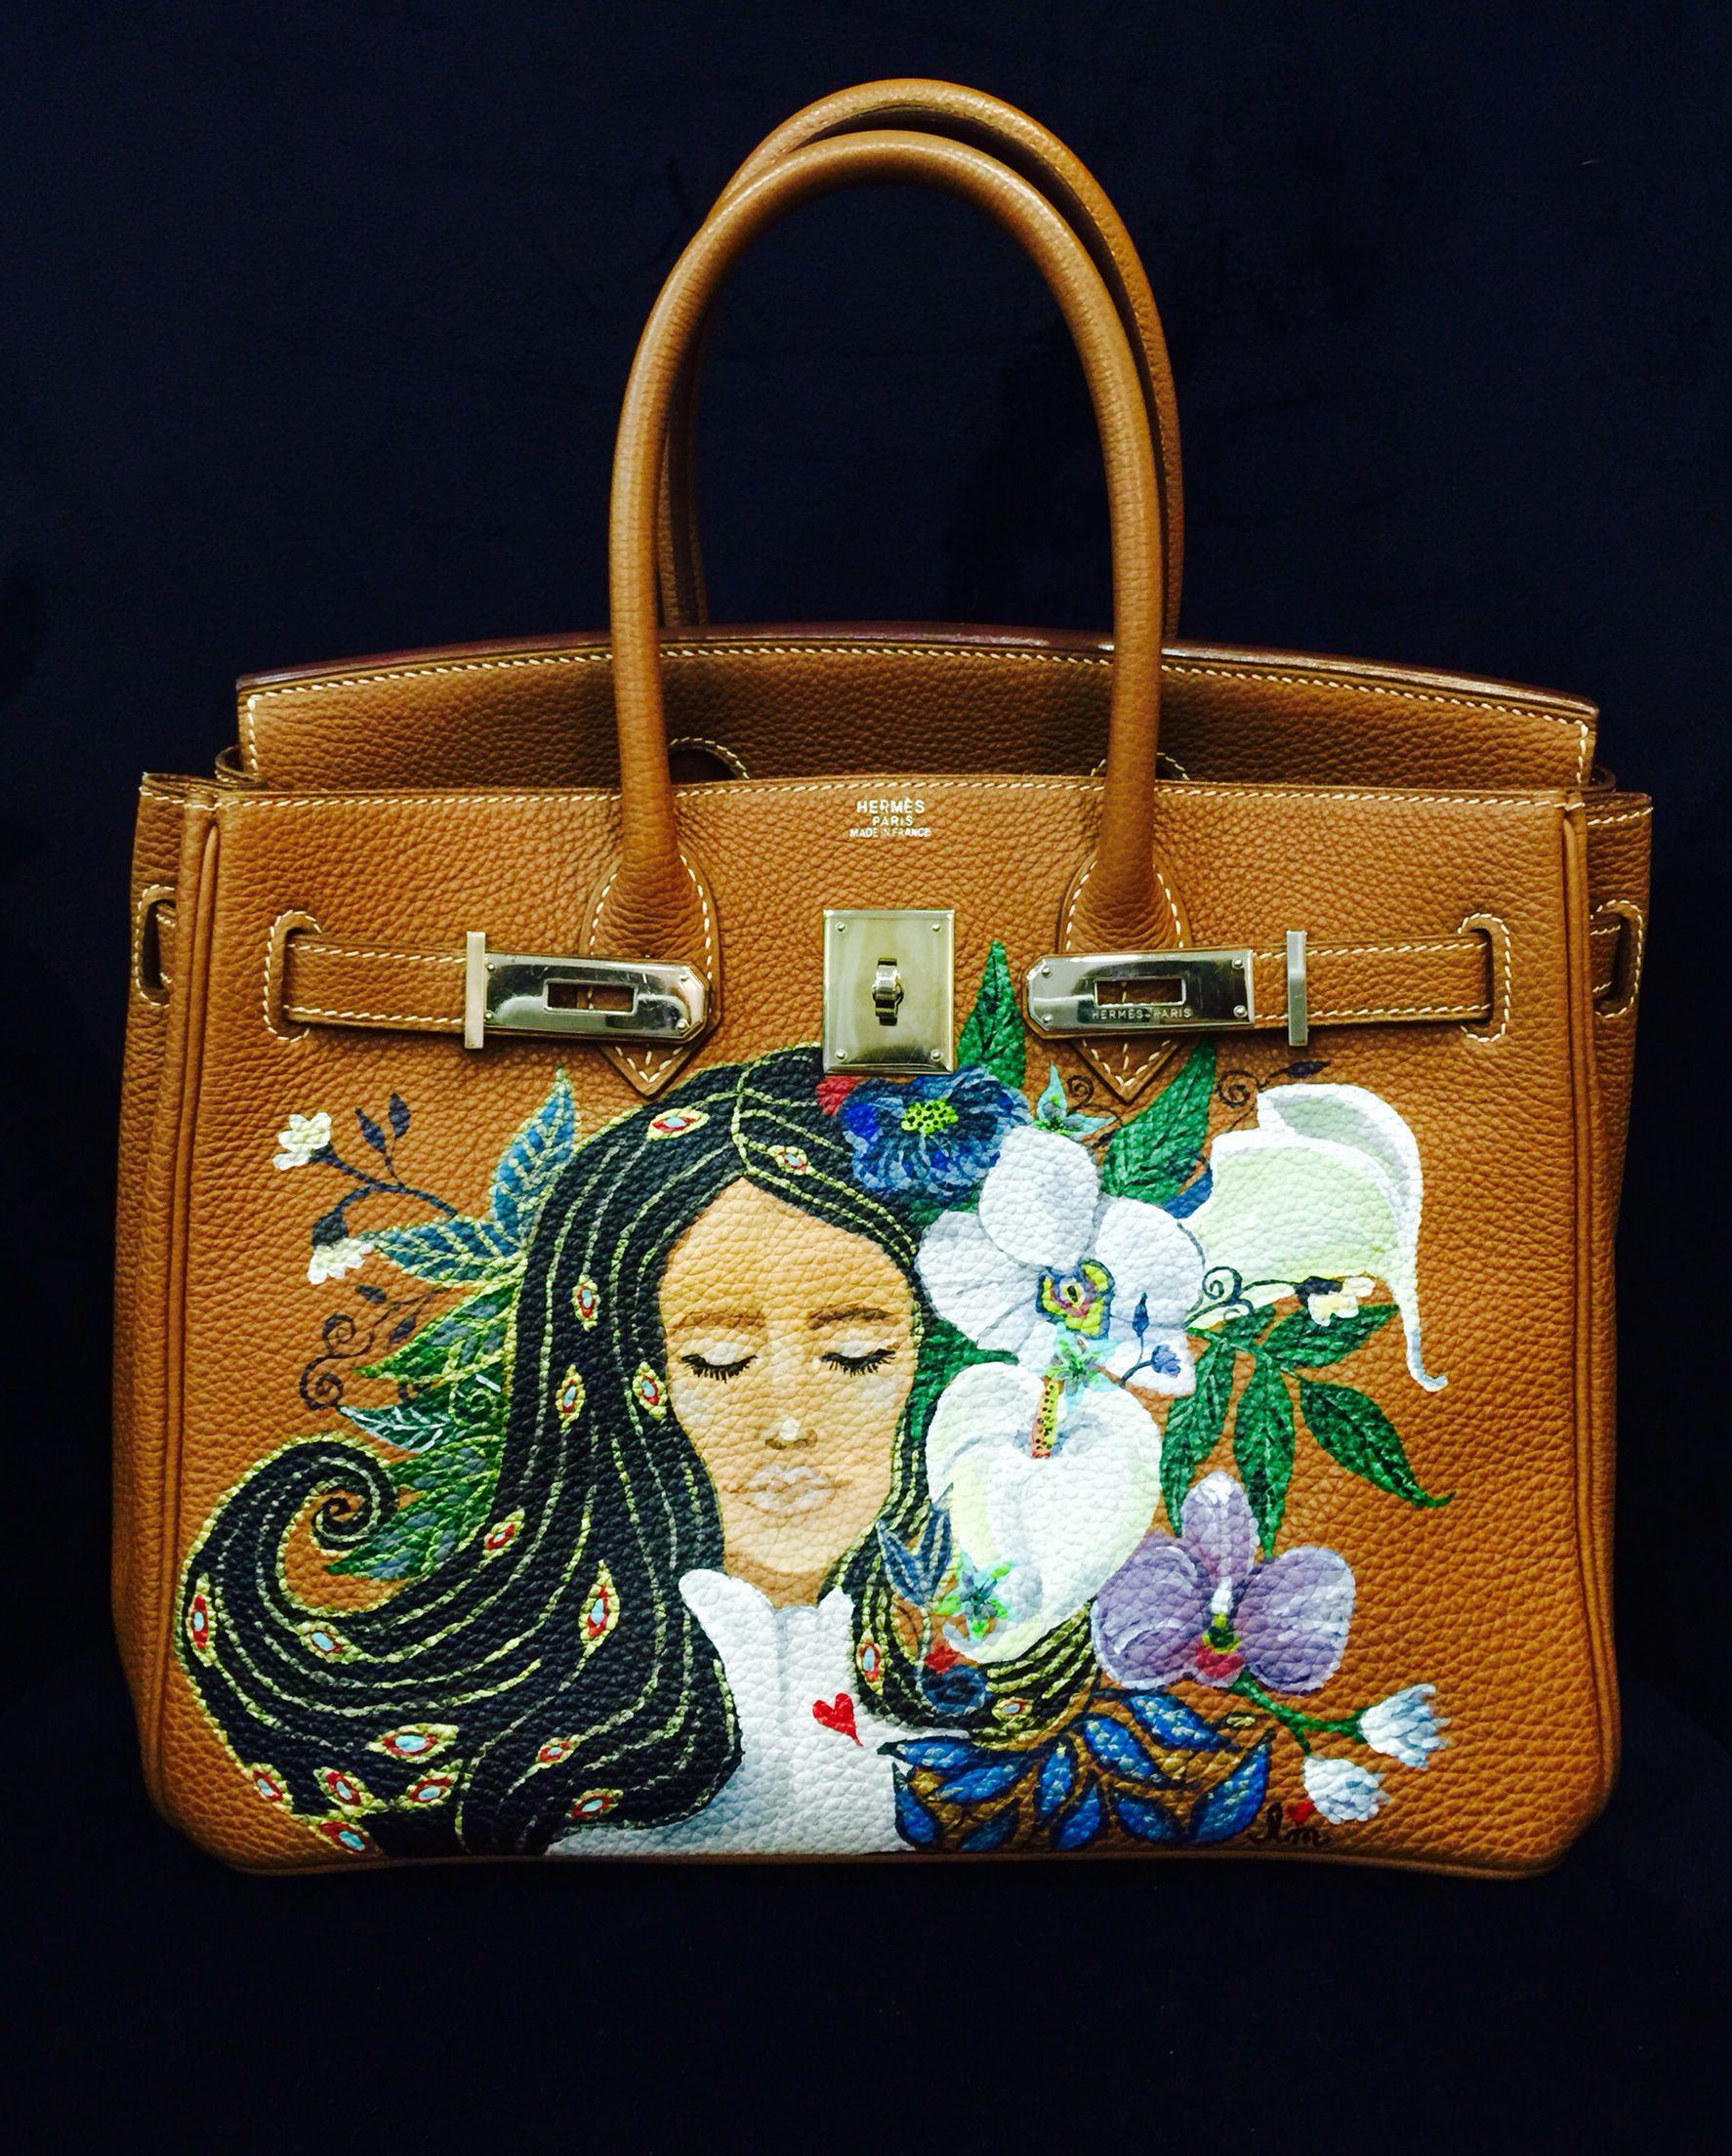 9358c557a338 Hermes Birkin hand painted by artist love Marie aka heart evangelista  Escudero ❤️